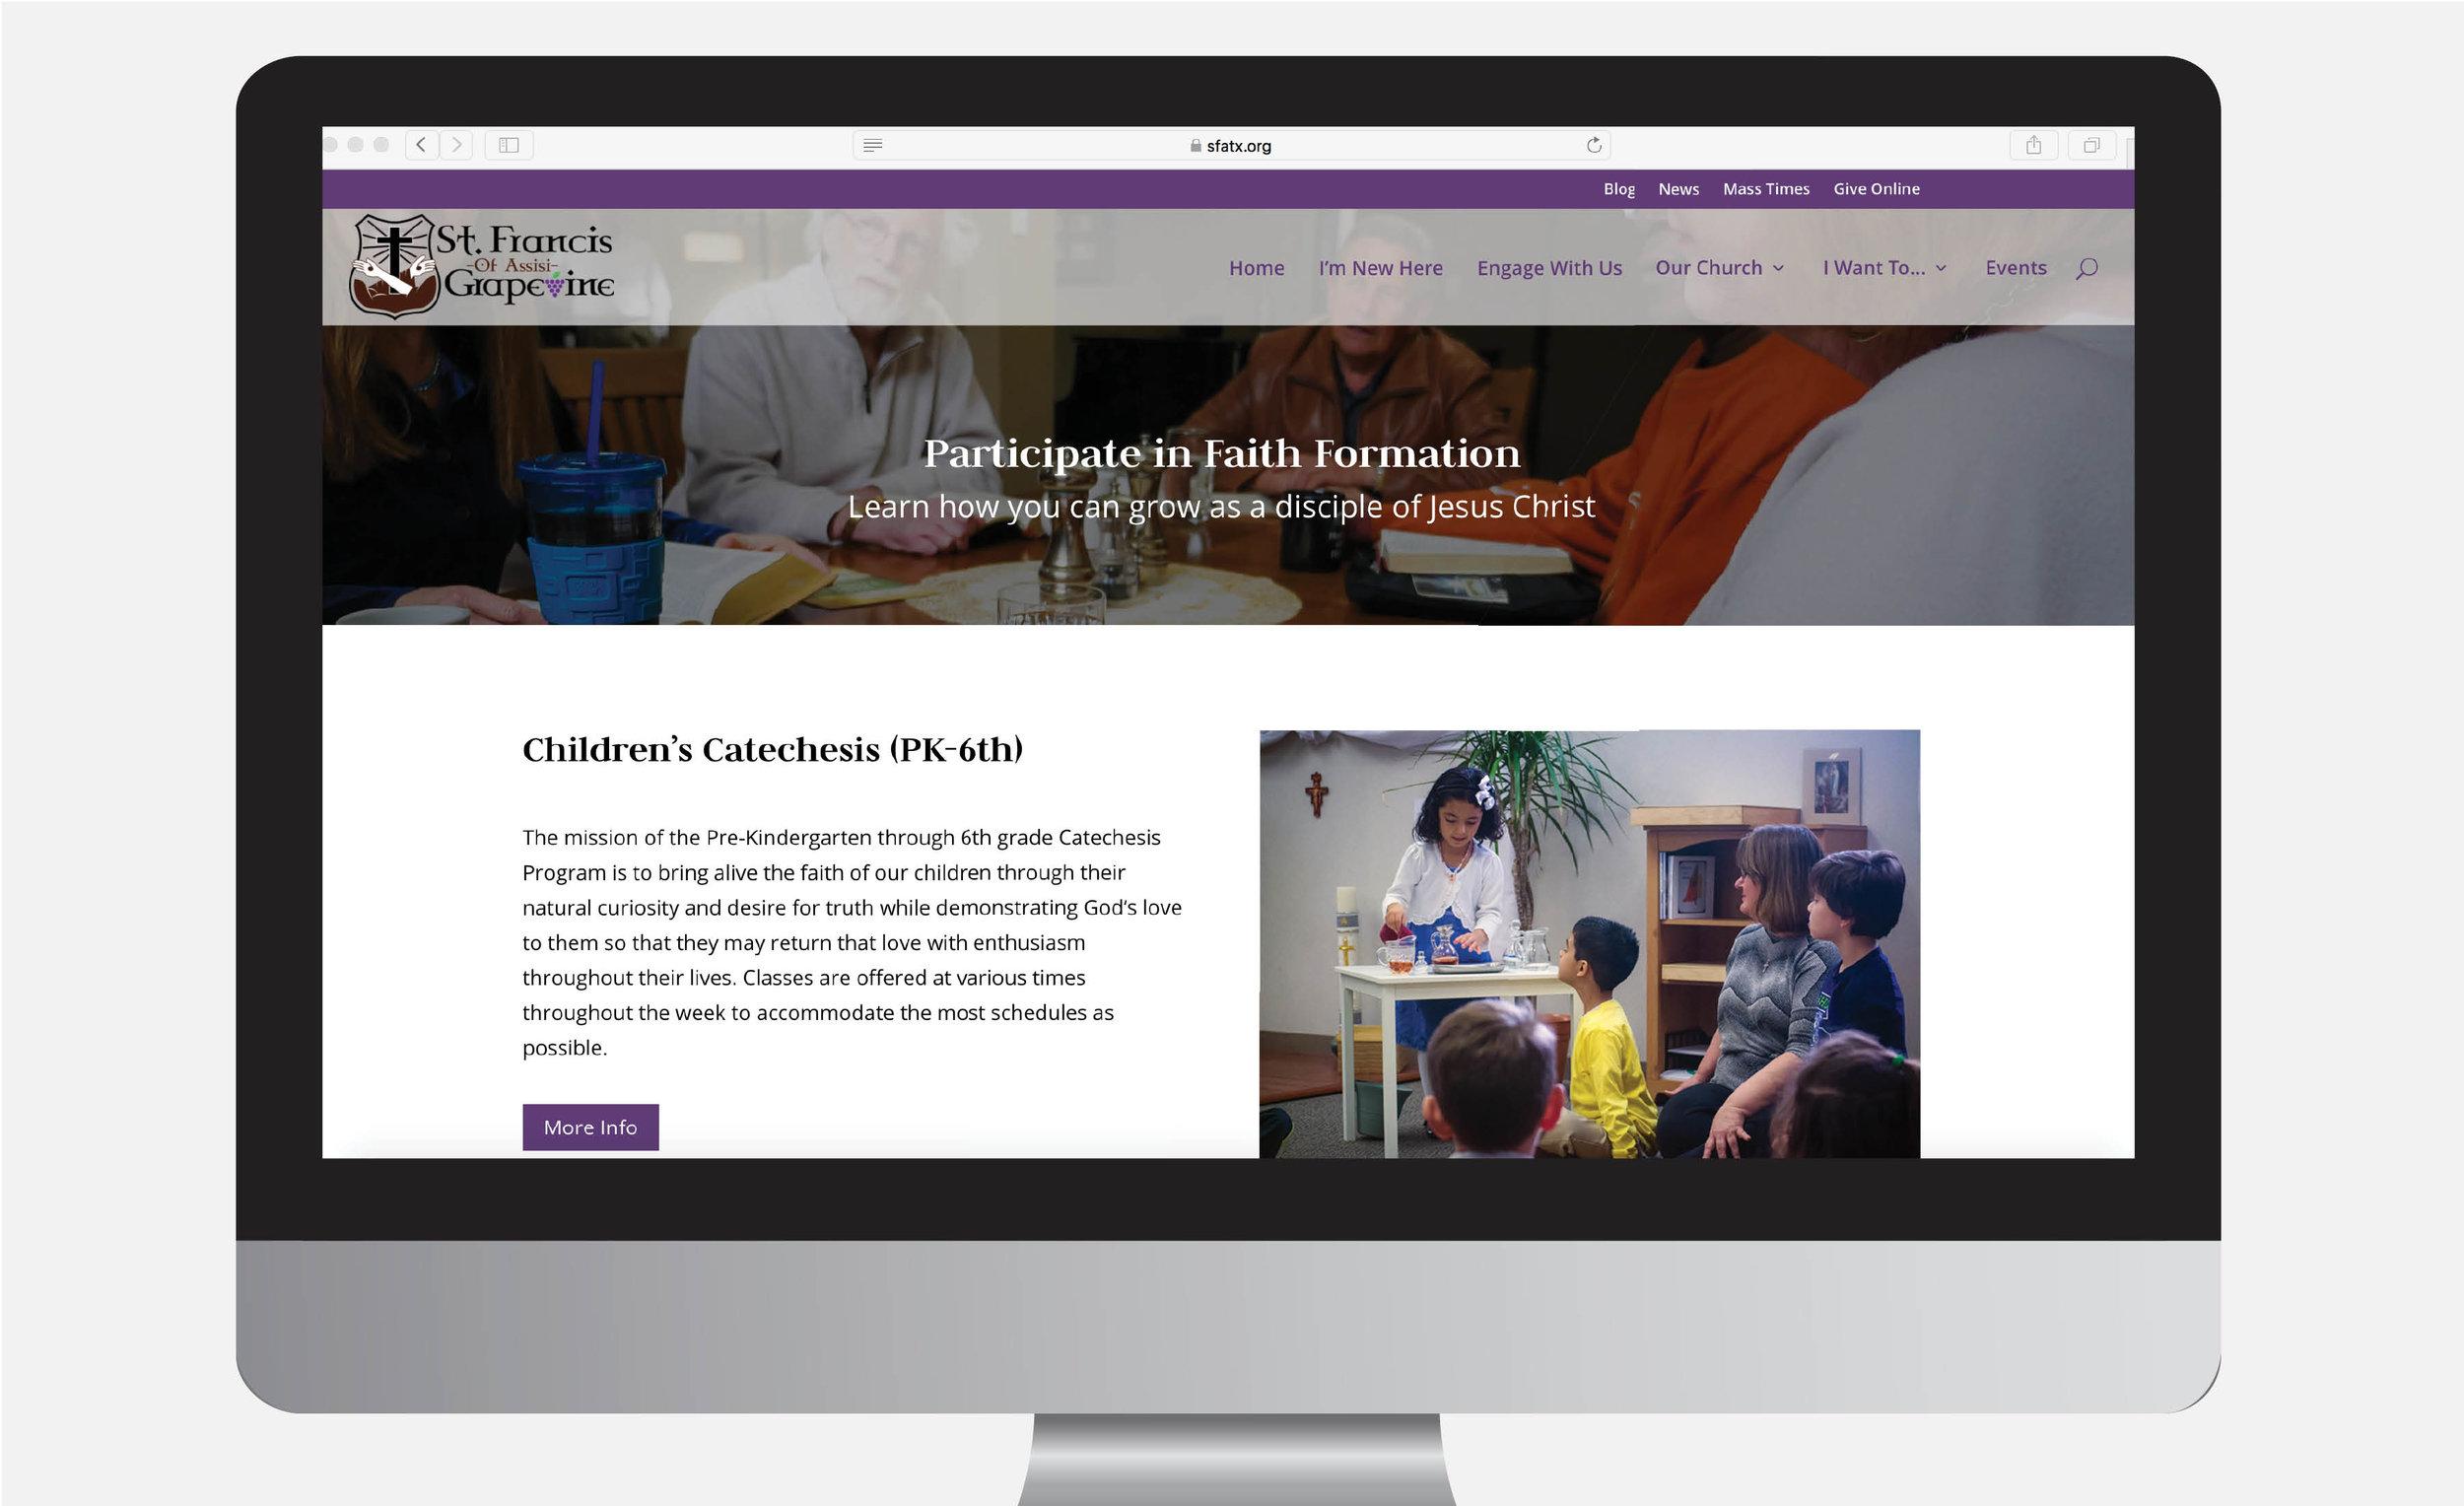 sfatx-website2.jpg